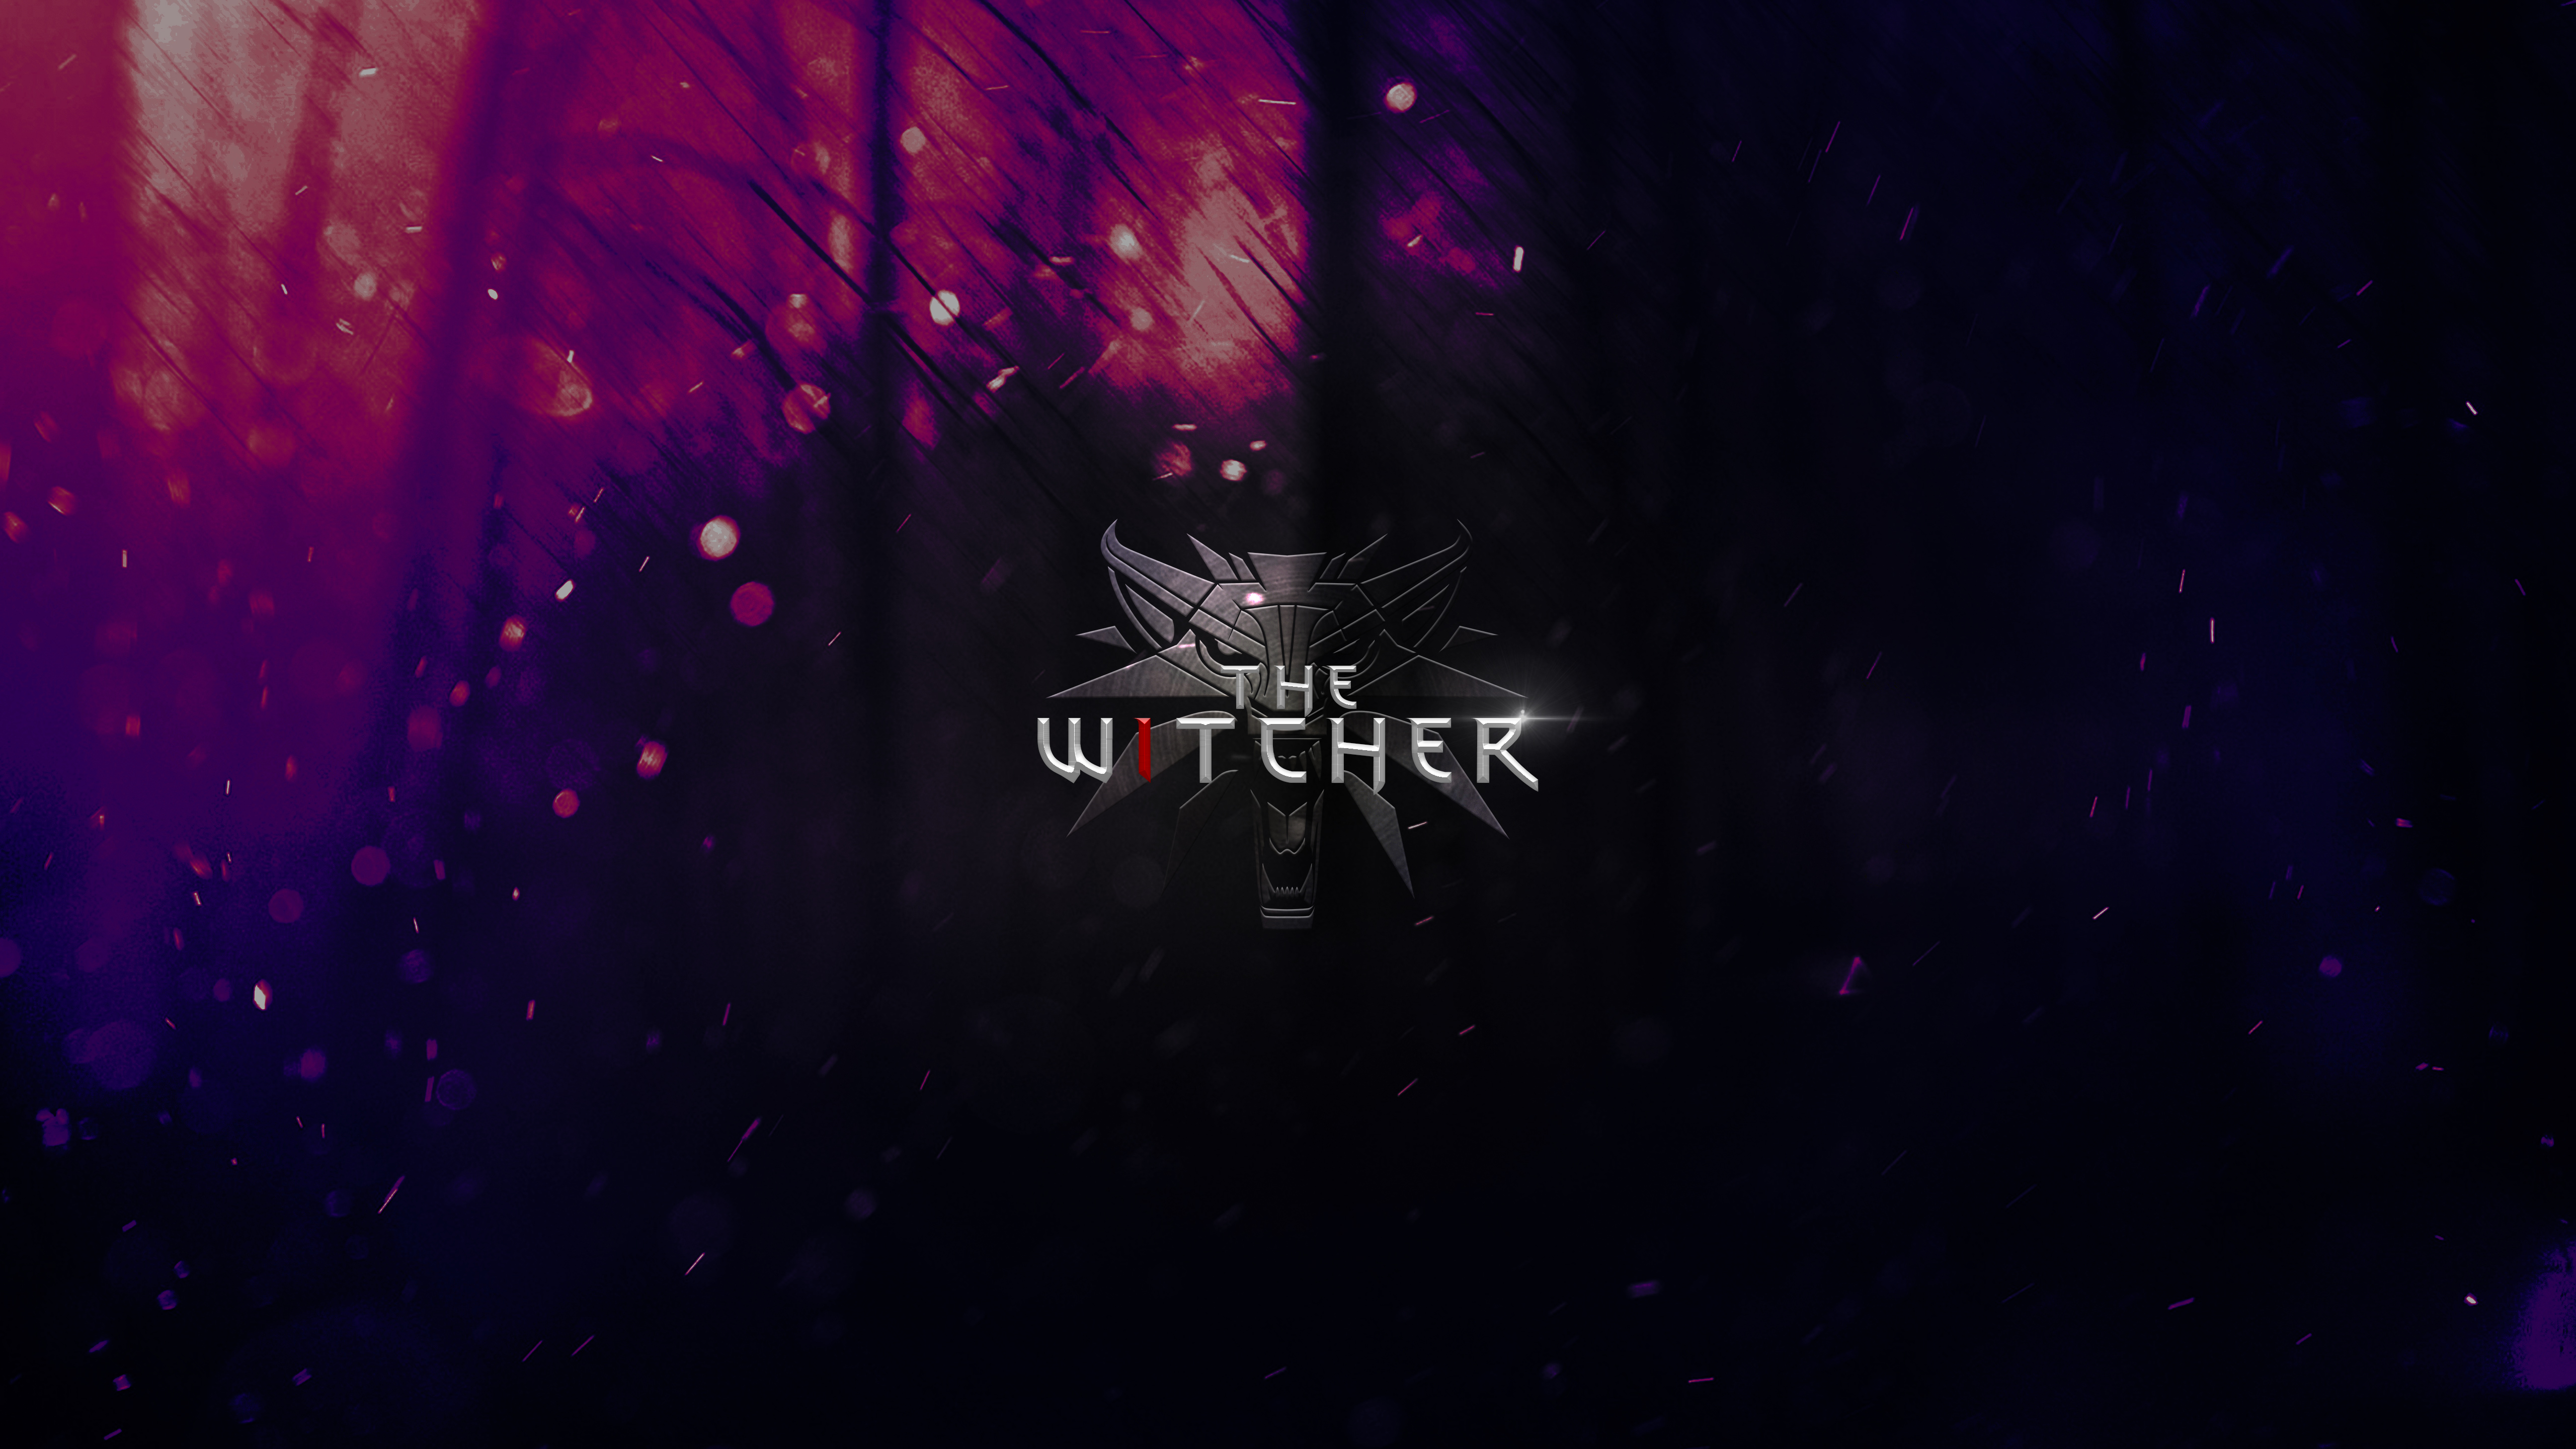 the witcher logo art 1580056481 - The Witcher Logo Art - The Witcher wallpapers ultra hd 4k, The Witcher Logo Art wallpapers 4k, The Witcher Logo Art 4k wallpapers